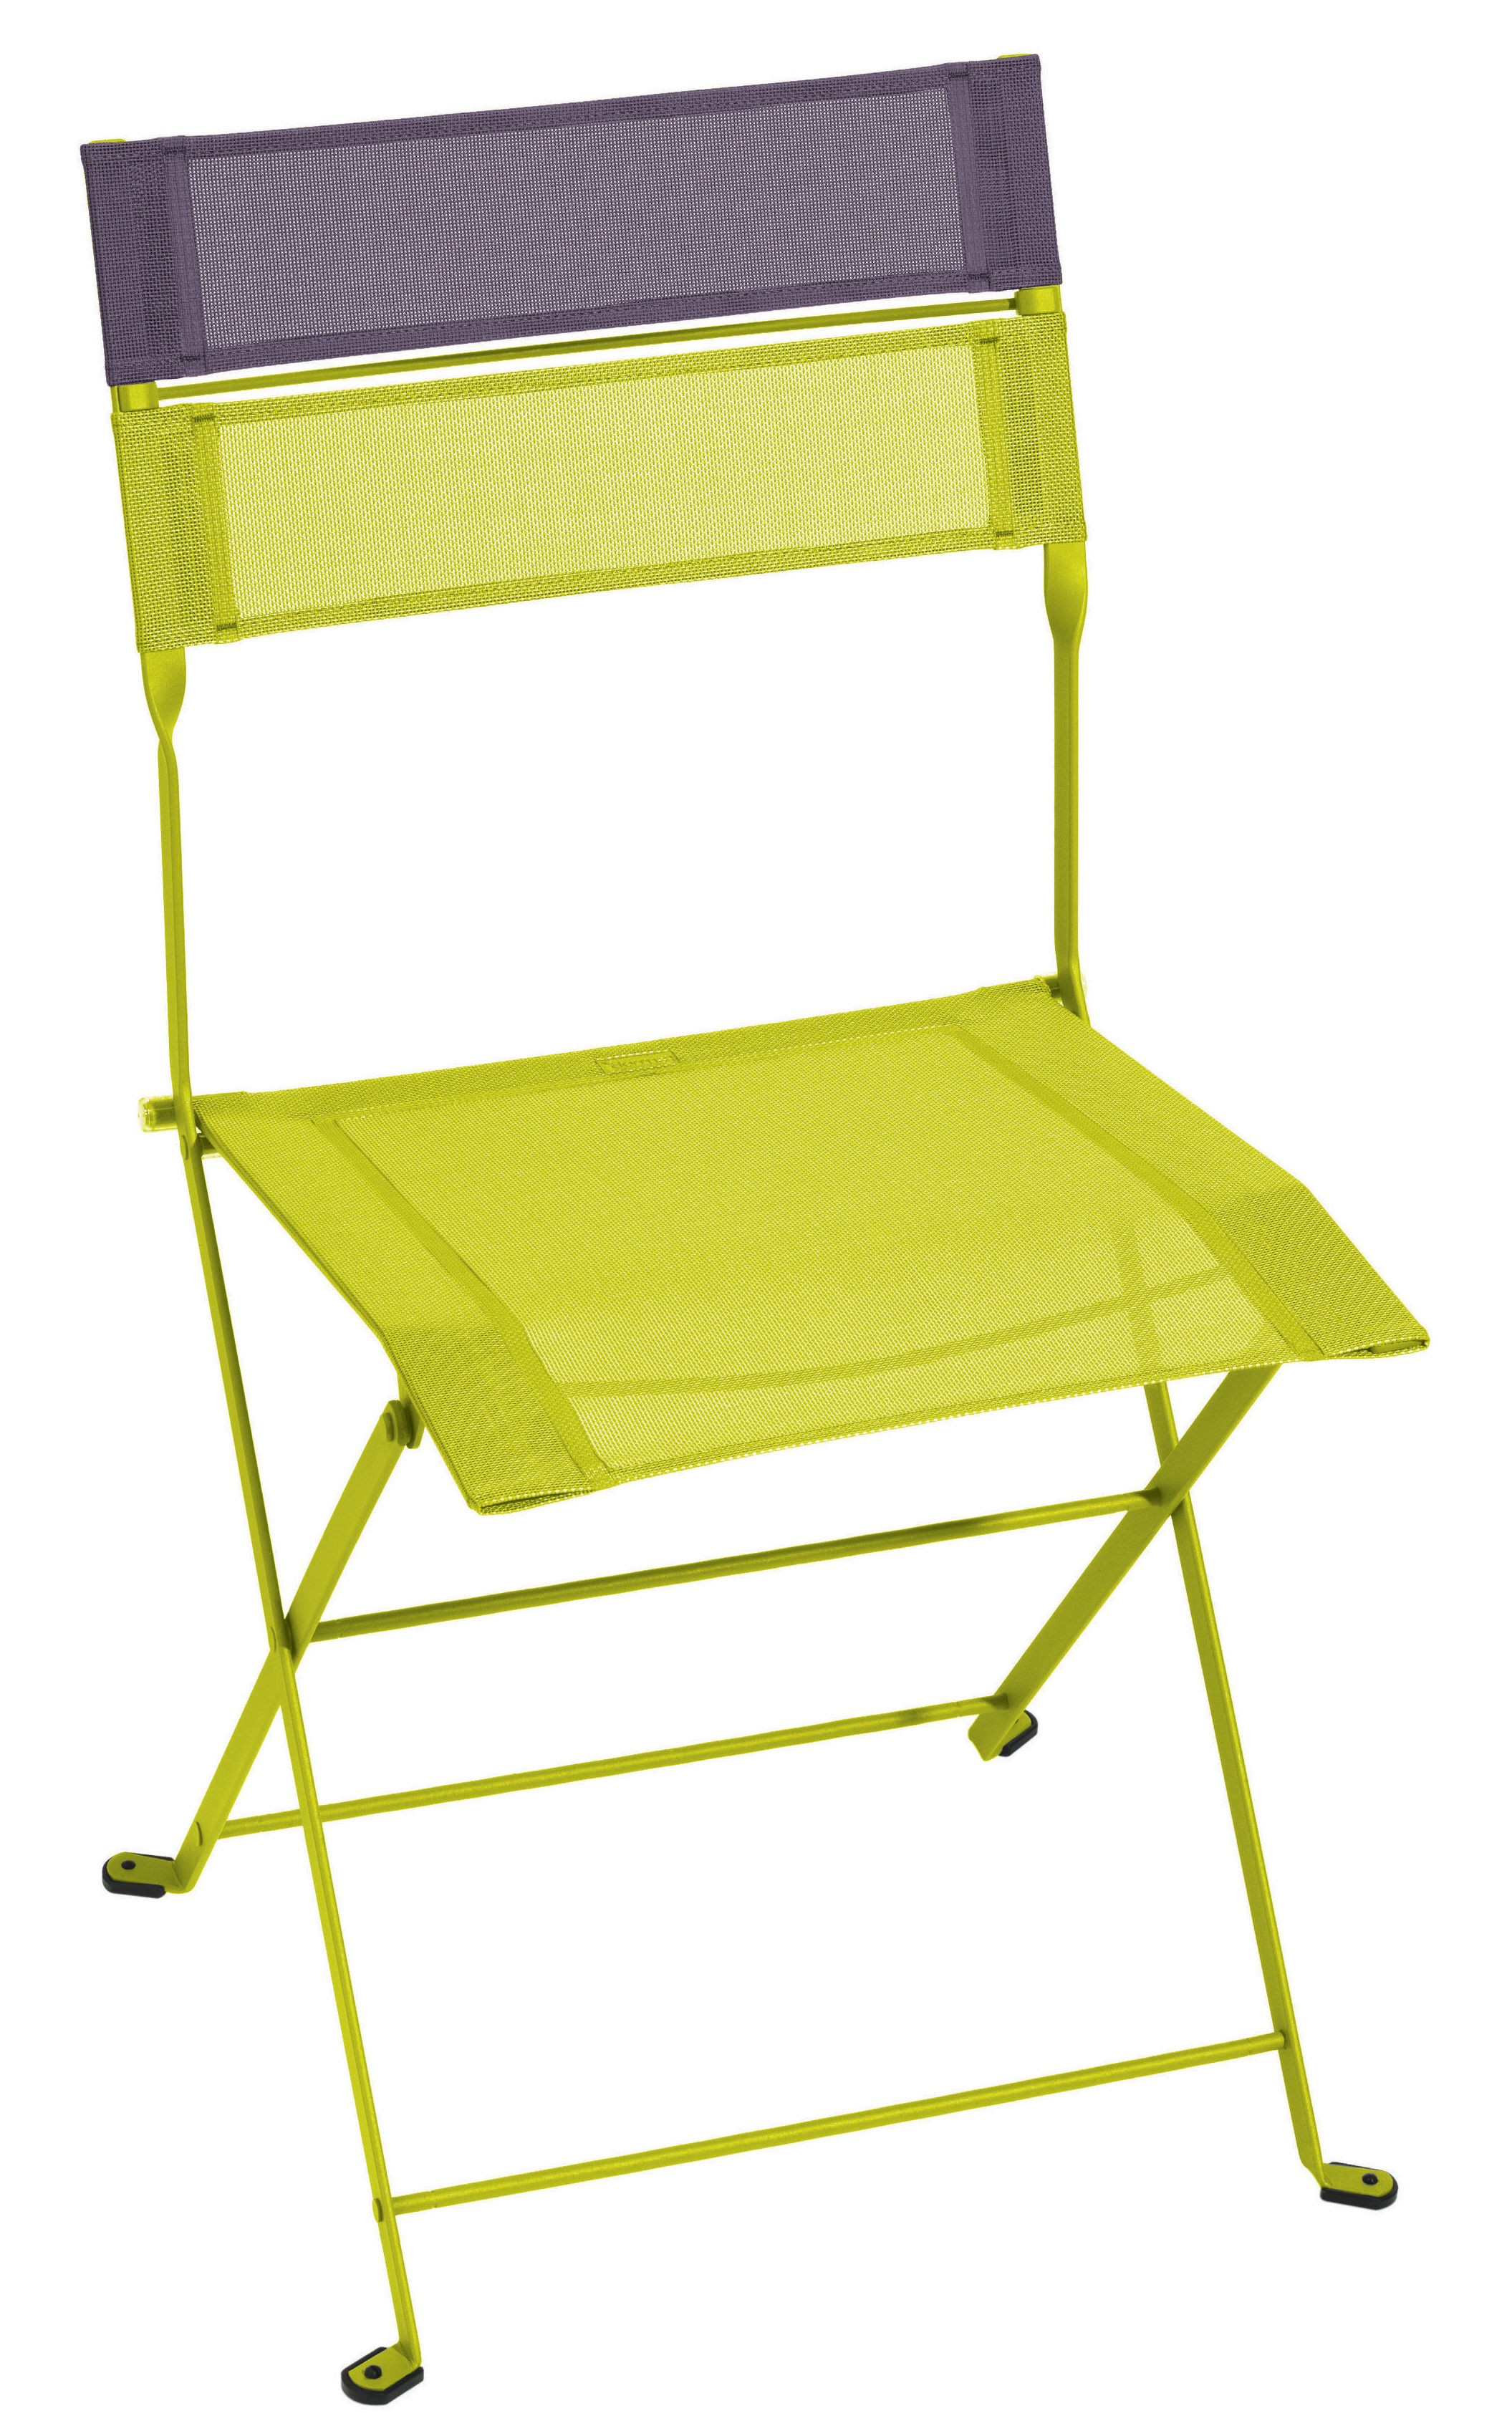 chaise pliante latitude de fermob prune. Black Bedroom Furniture Sets. Home Design Ideas